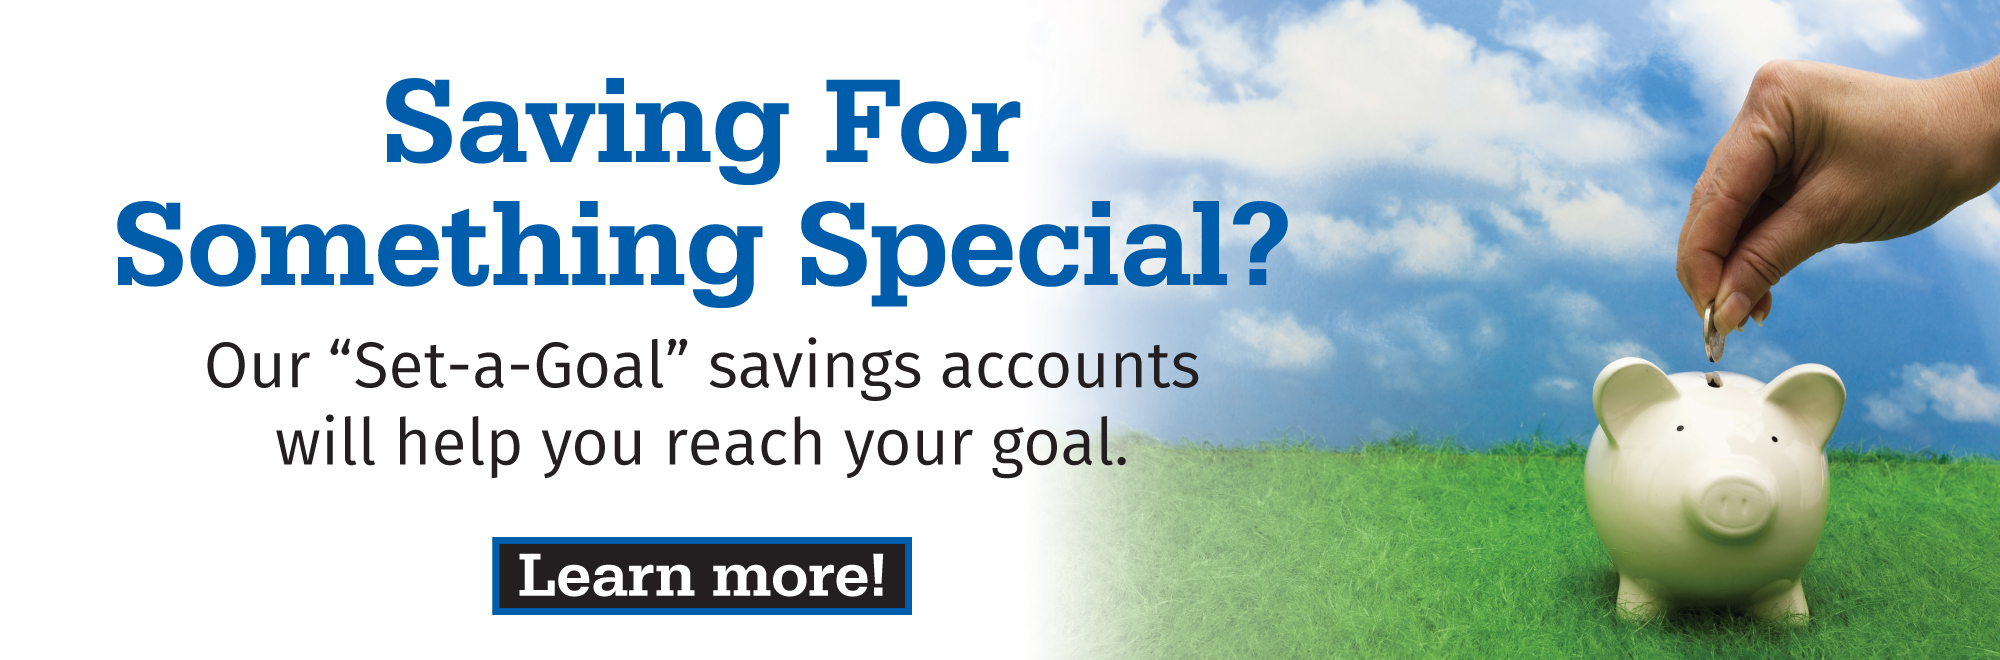 Set-a-Goal Savings